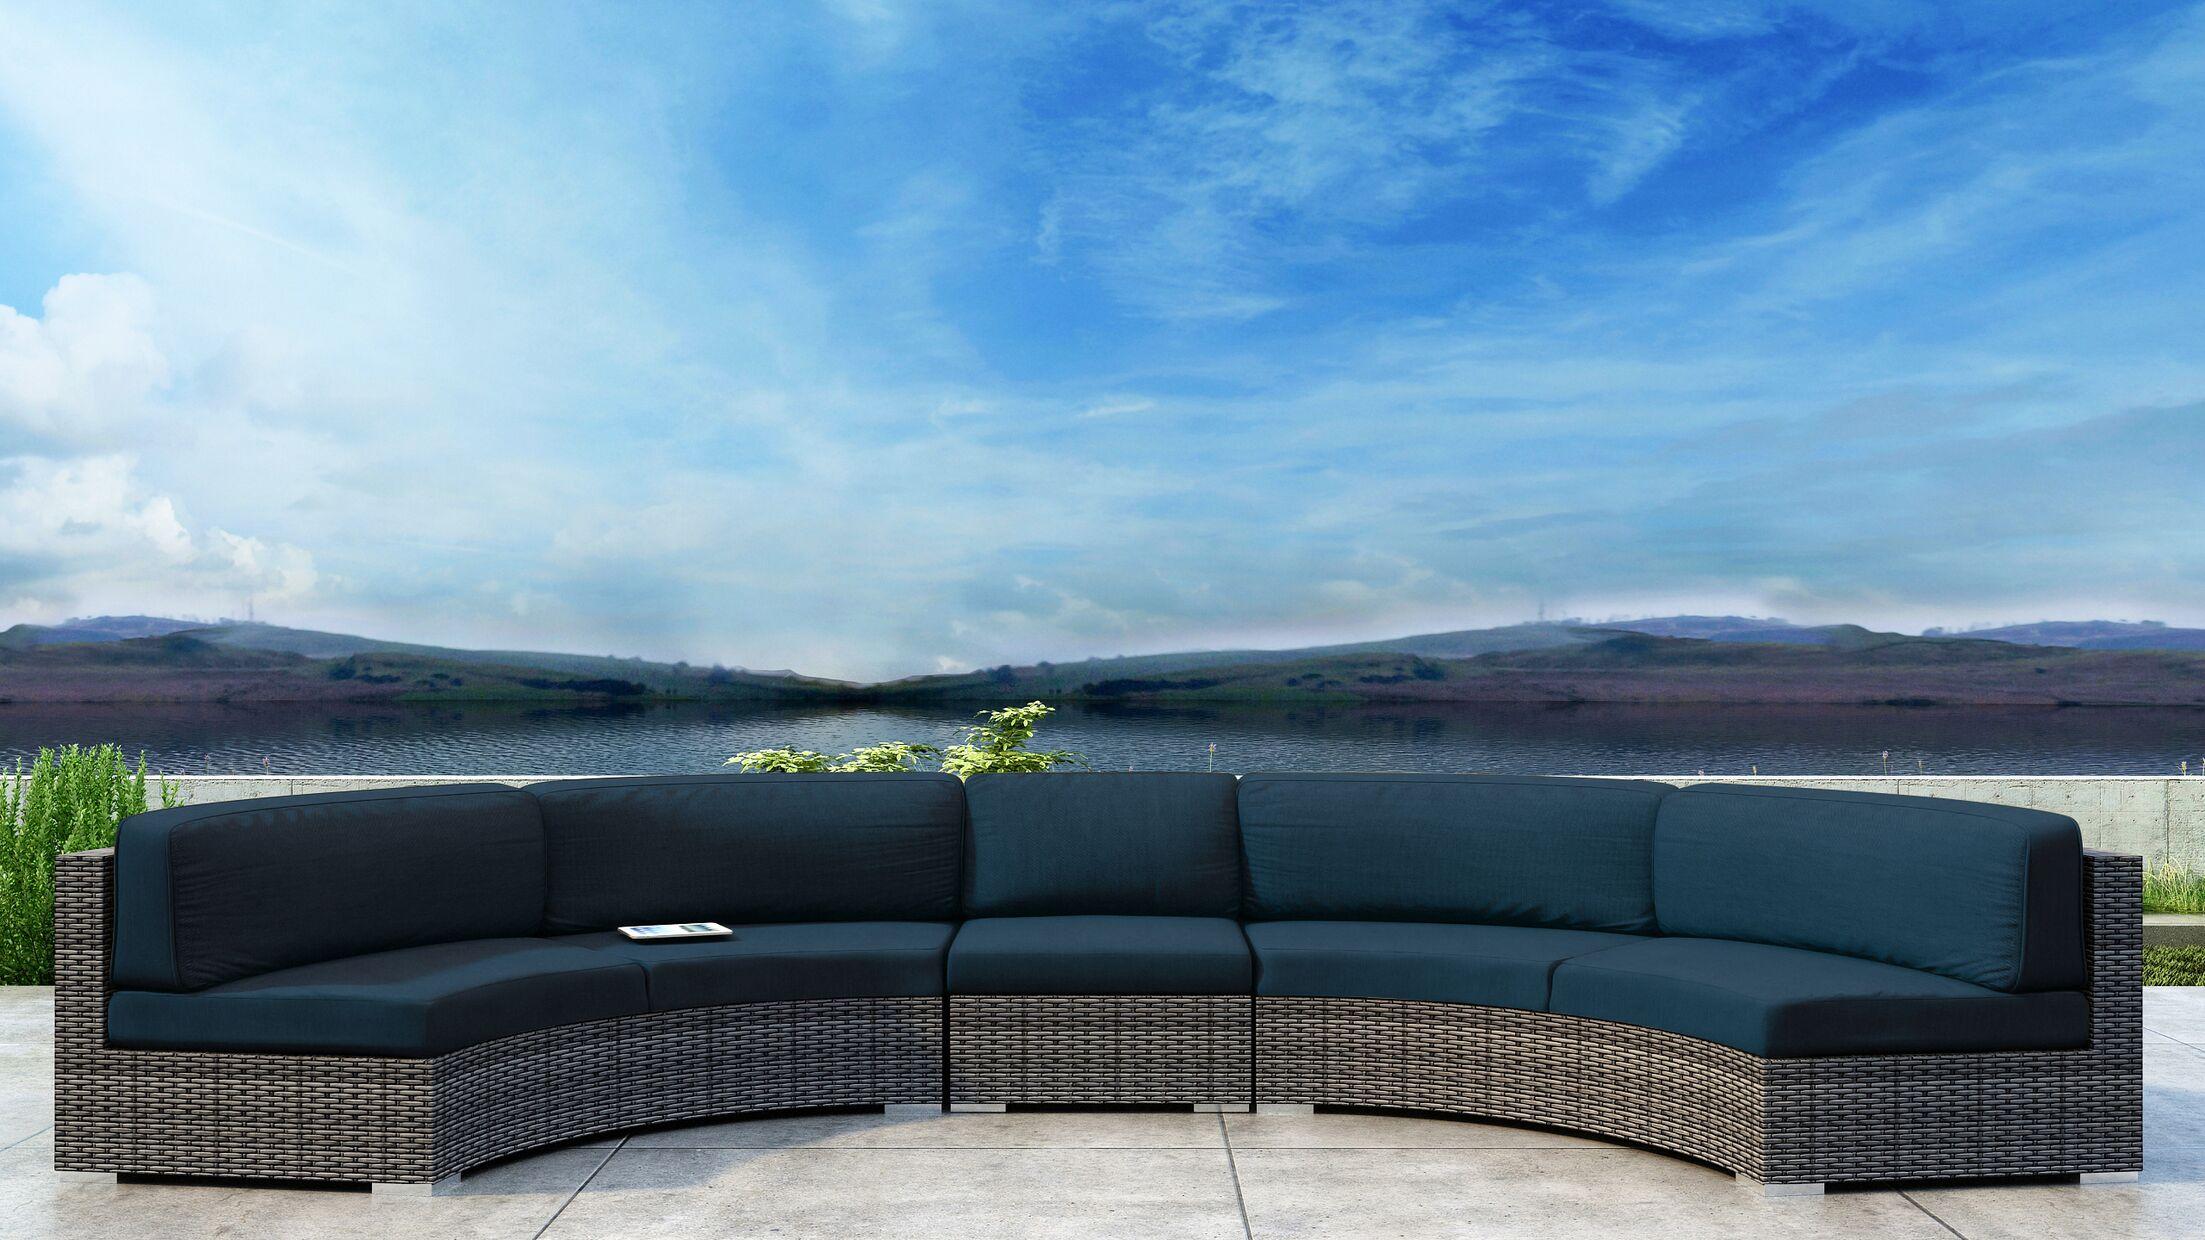 Gilleland 3 Piece Sectional Set with Sunbrella Cushion Cushion Color: Spectrum Indigo